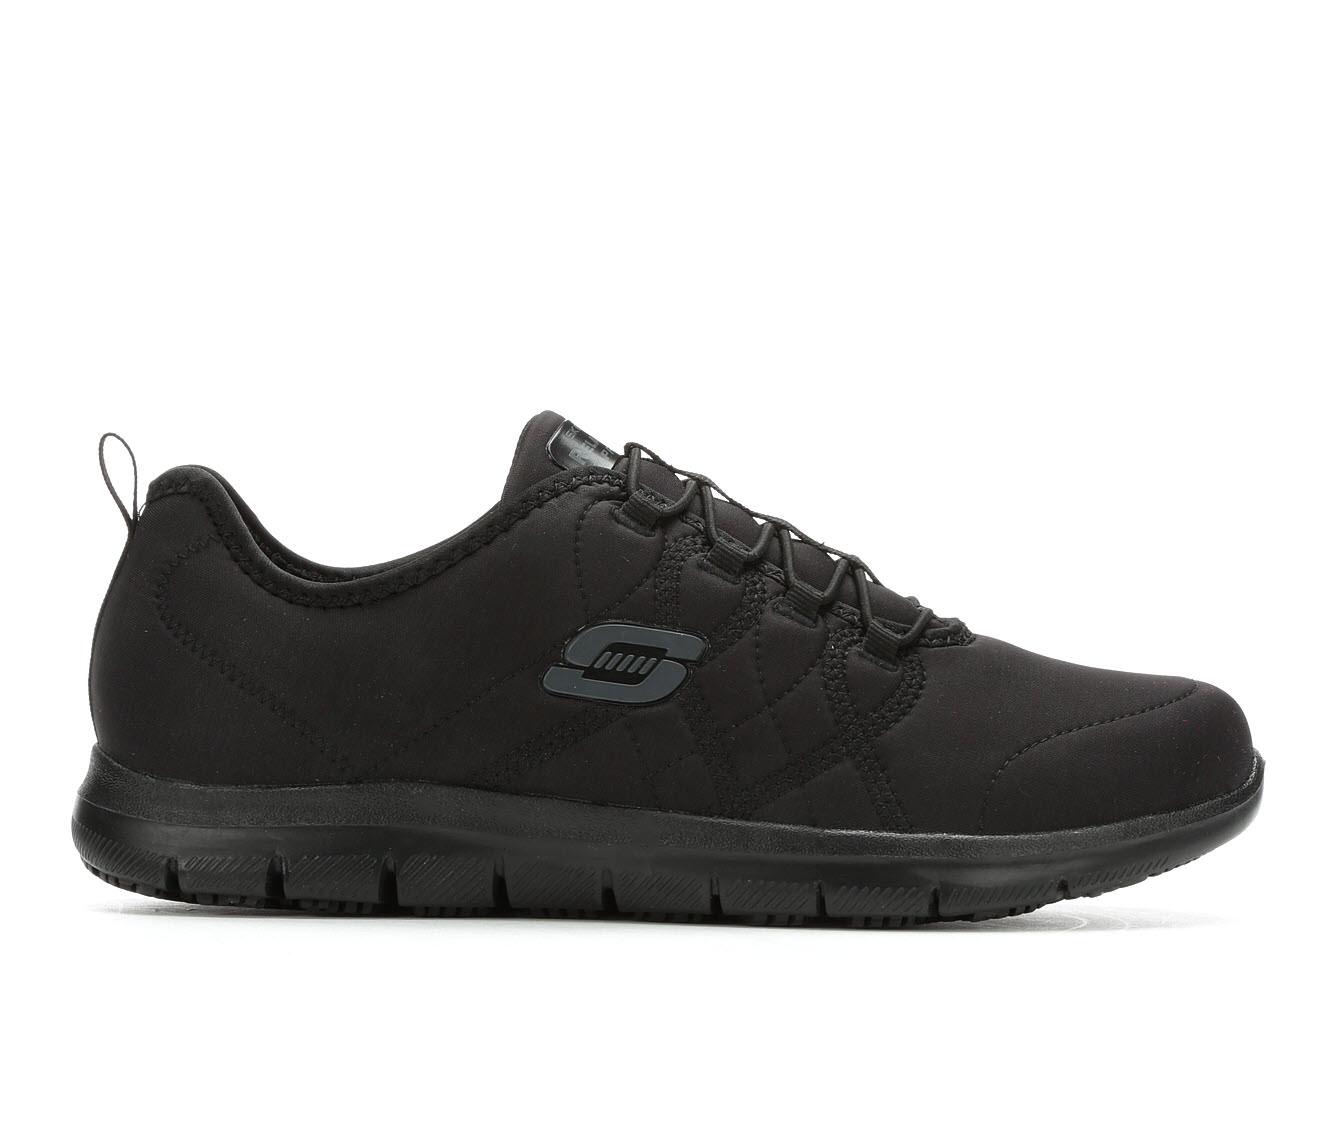 Skechers Work 77211 Srelt Men's Boots (Black Leather)